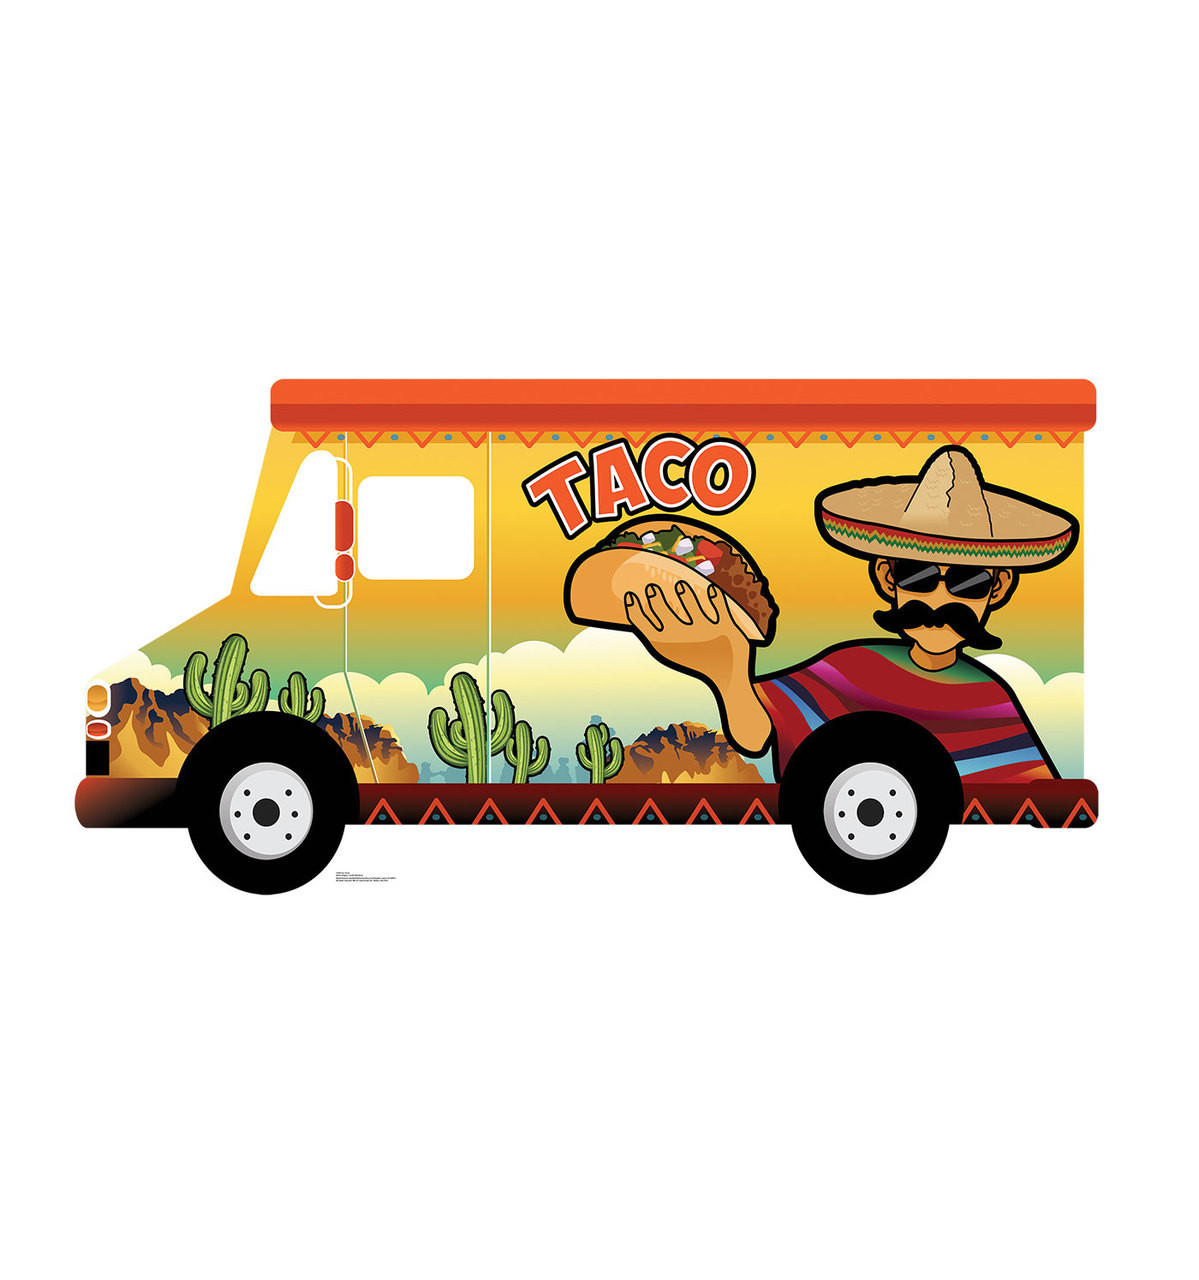 Life-size Taco Truck Standin Cardboard Standup 3